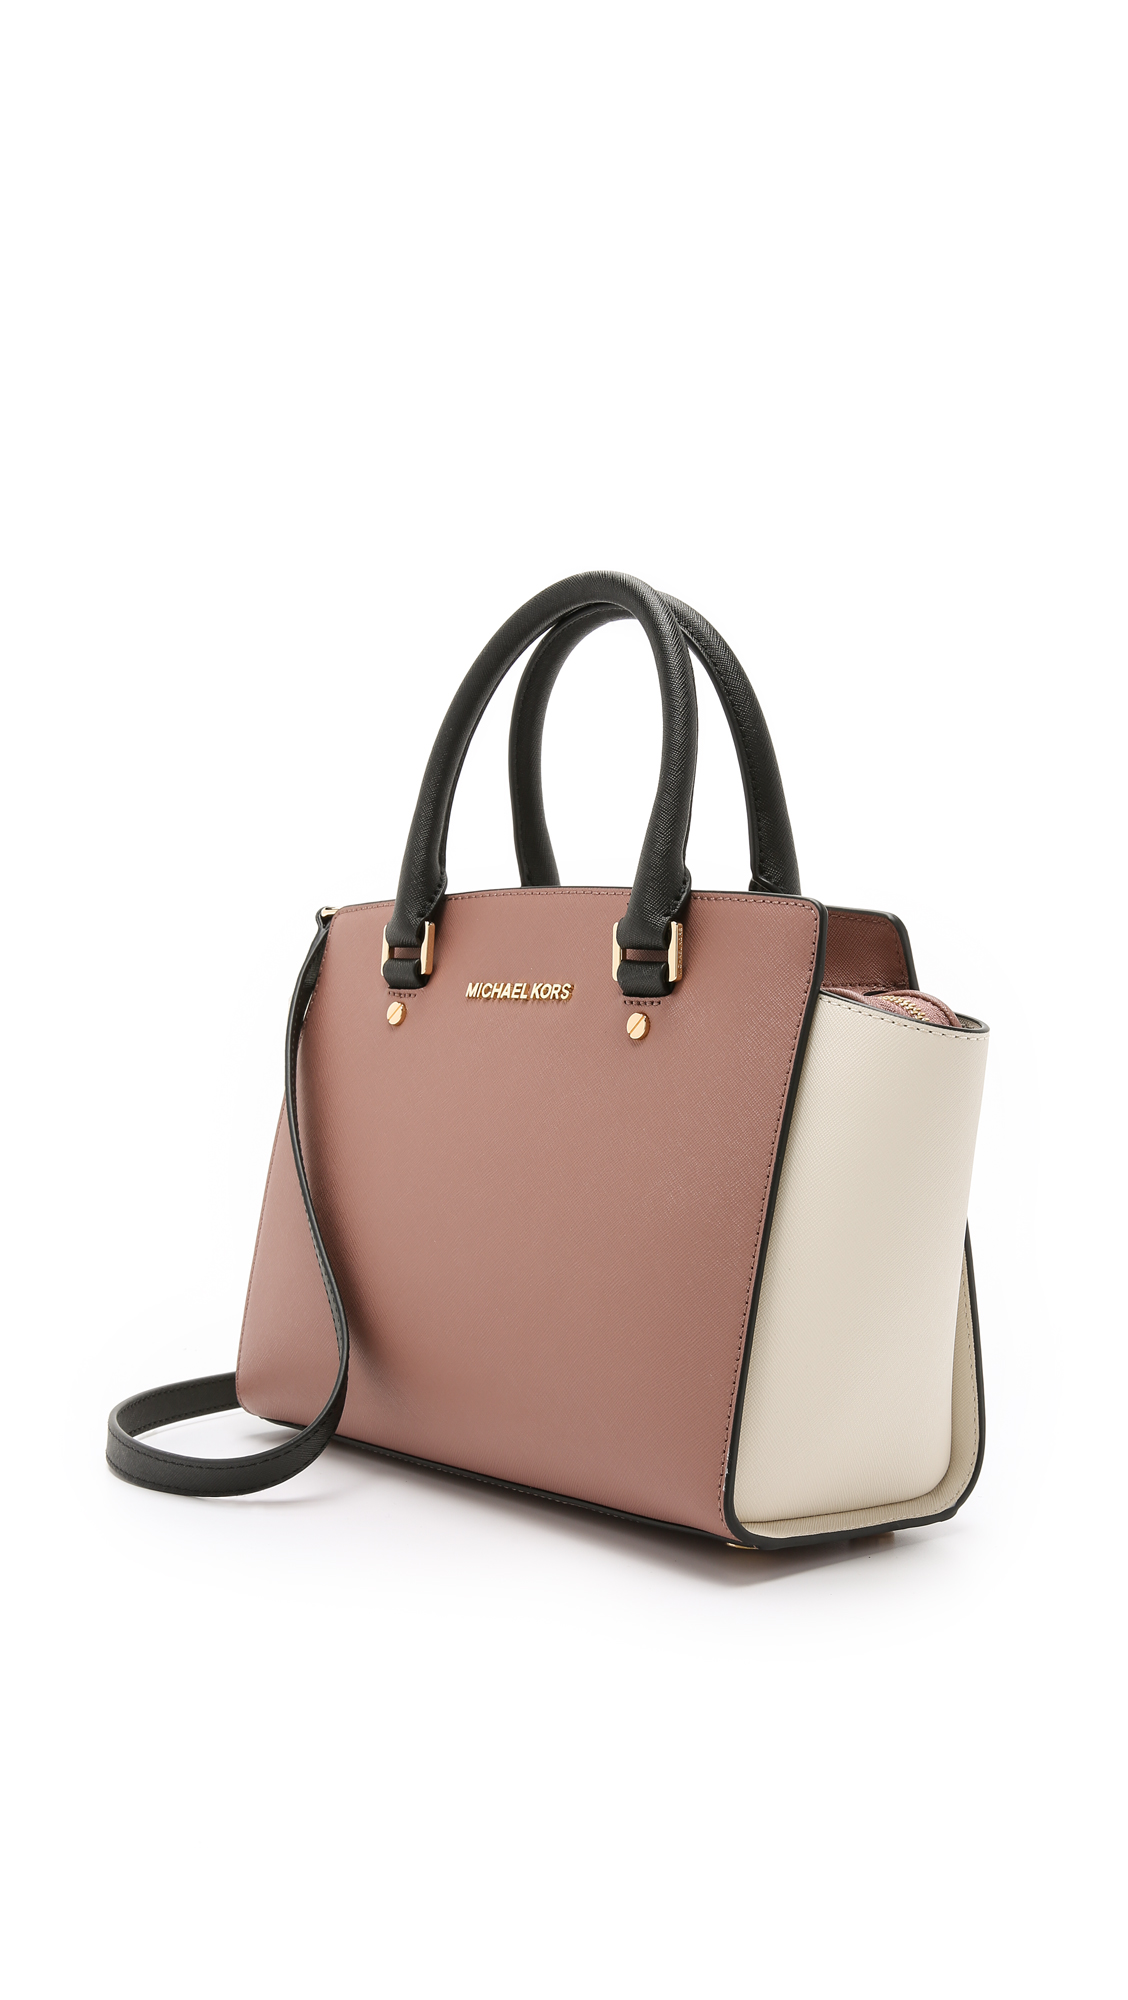 e8cedb5e7d91 clearance michael michael kors selma medium top zip satchel shopbop save up  to 25 use code